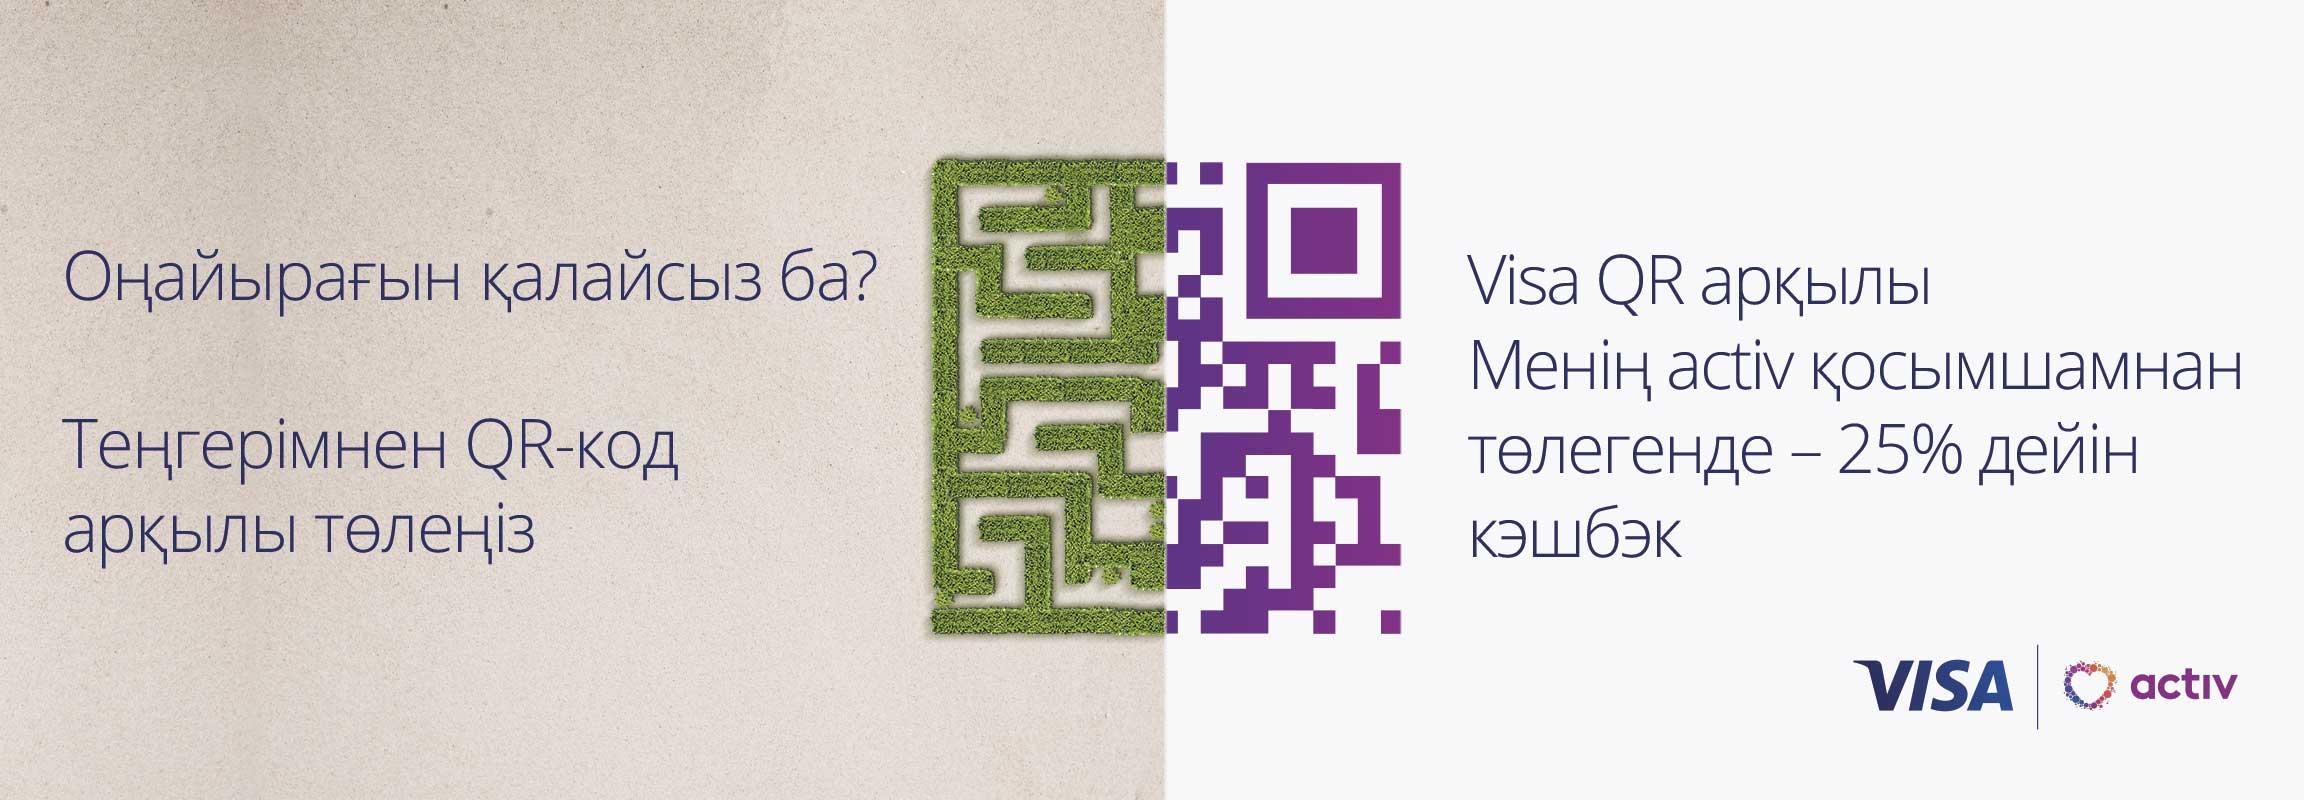 Visa QR